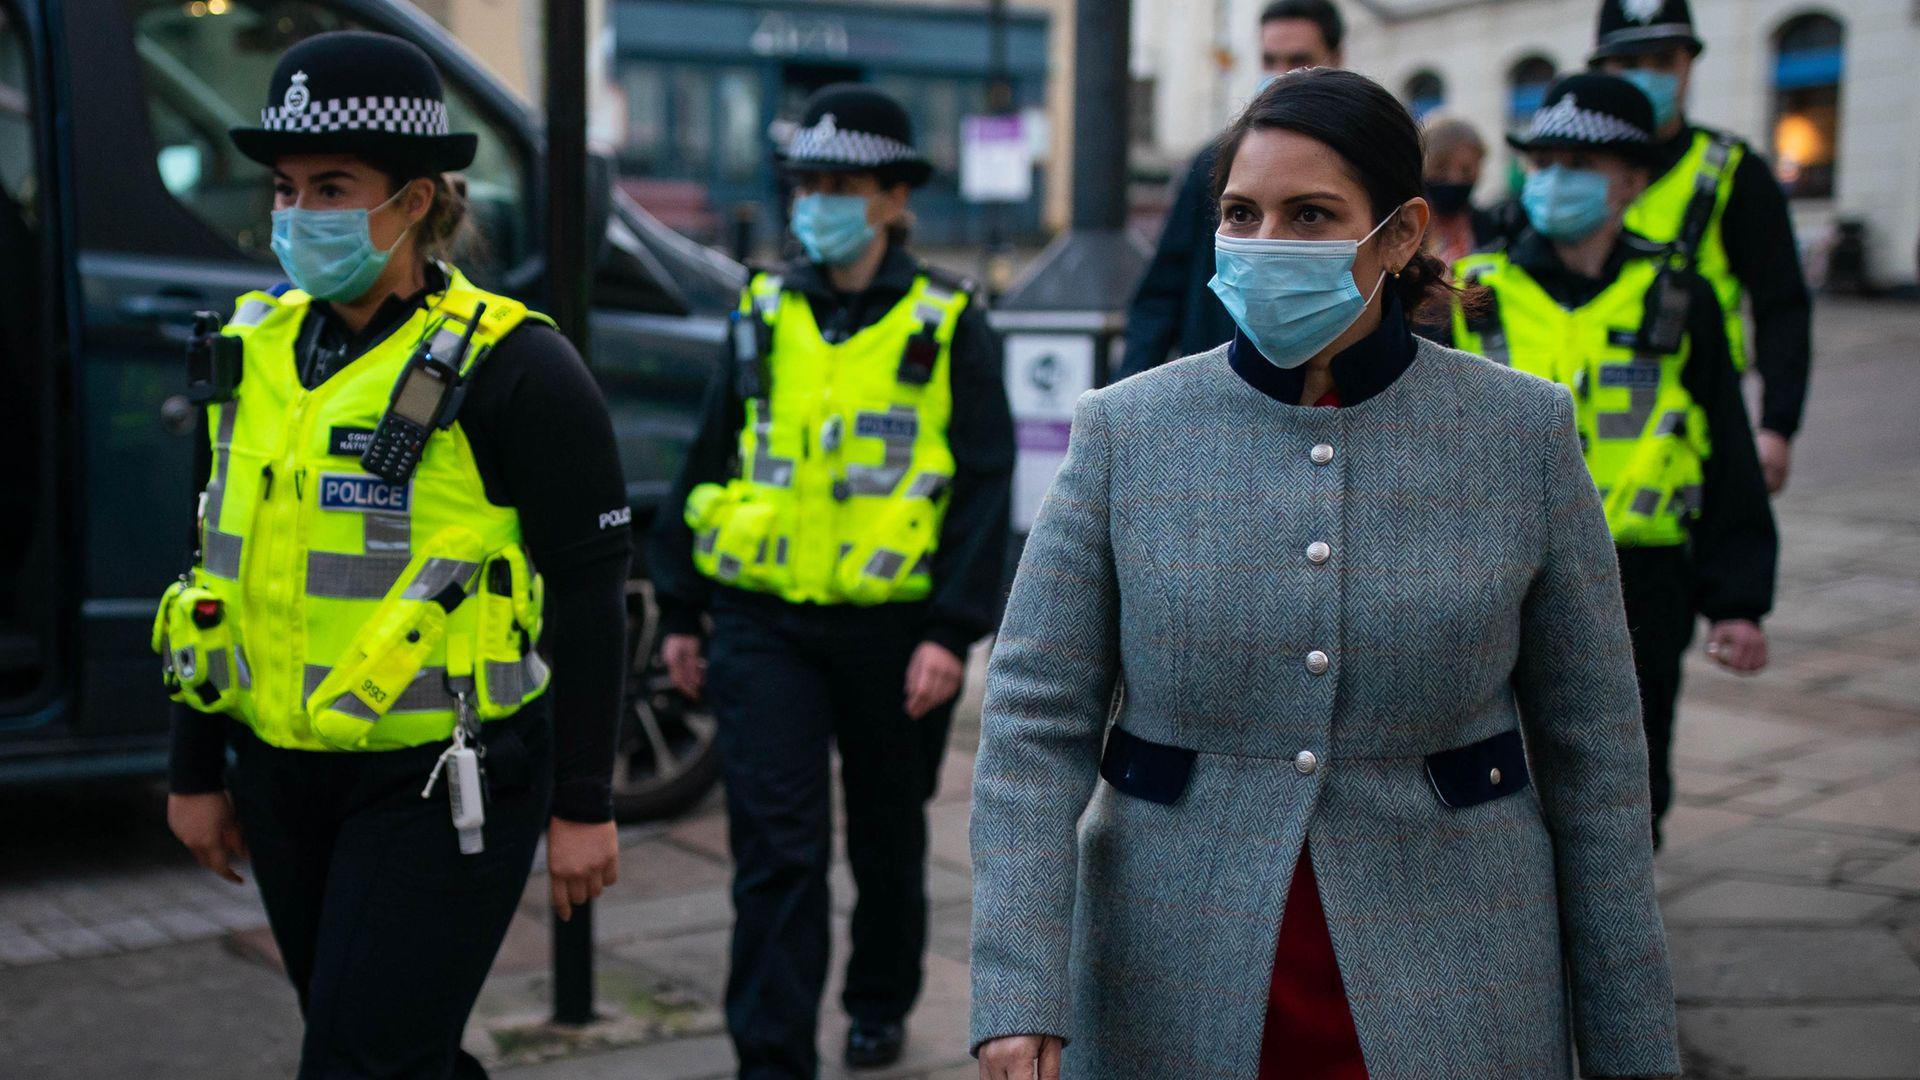 Home Secretary Priti Patel during a foot patrol with new police recruits around Bishop's Stortford, Hertfordshire - Credit: PA